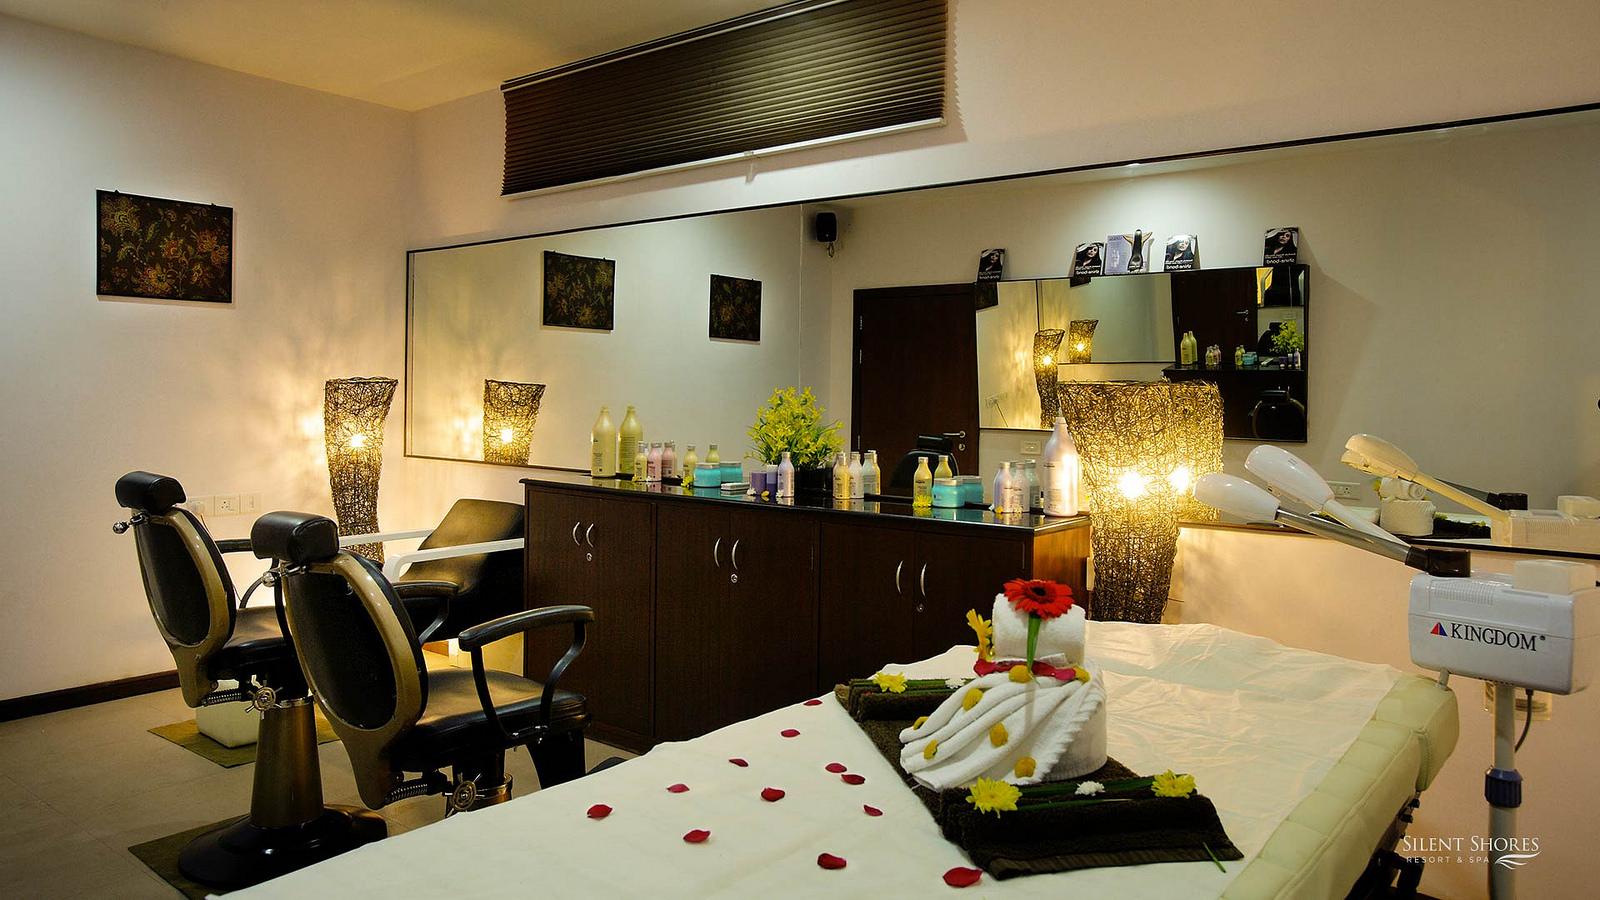 silent-shores-ayurveda-resort-and-spa-mysore-karnataka-5